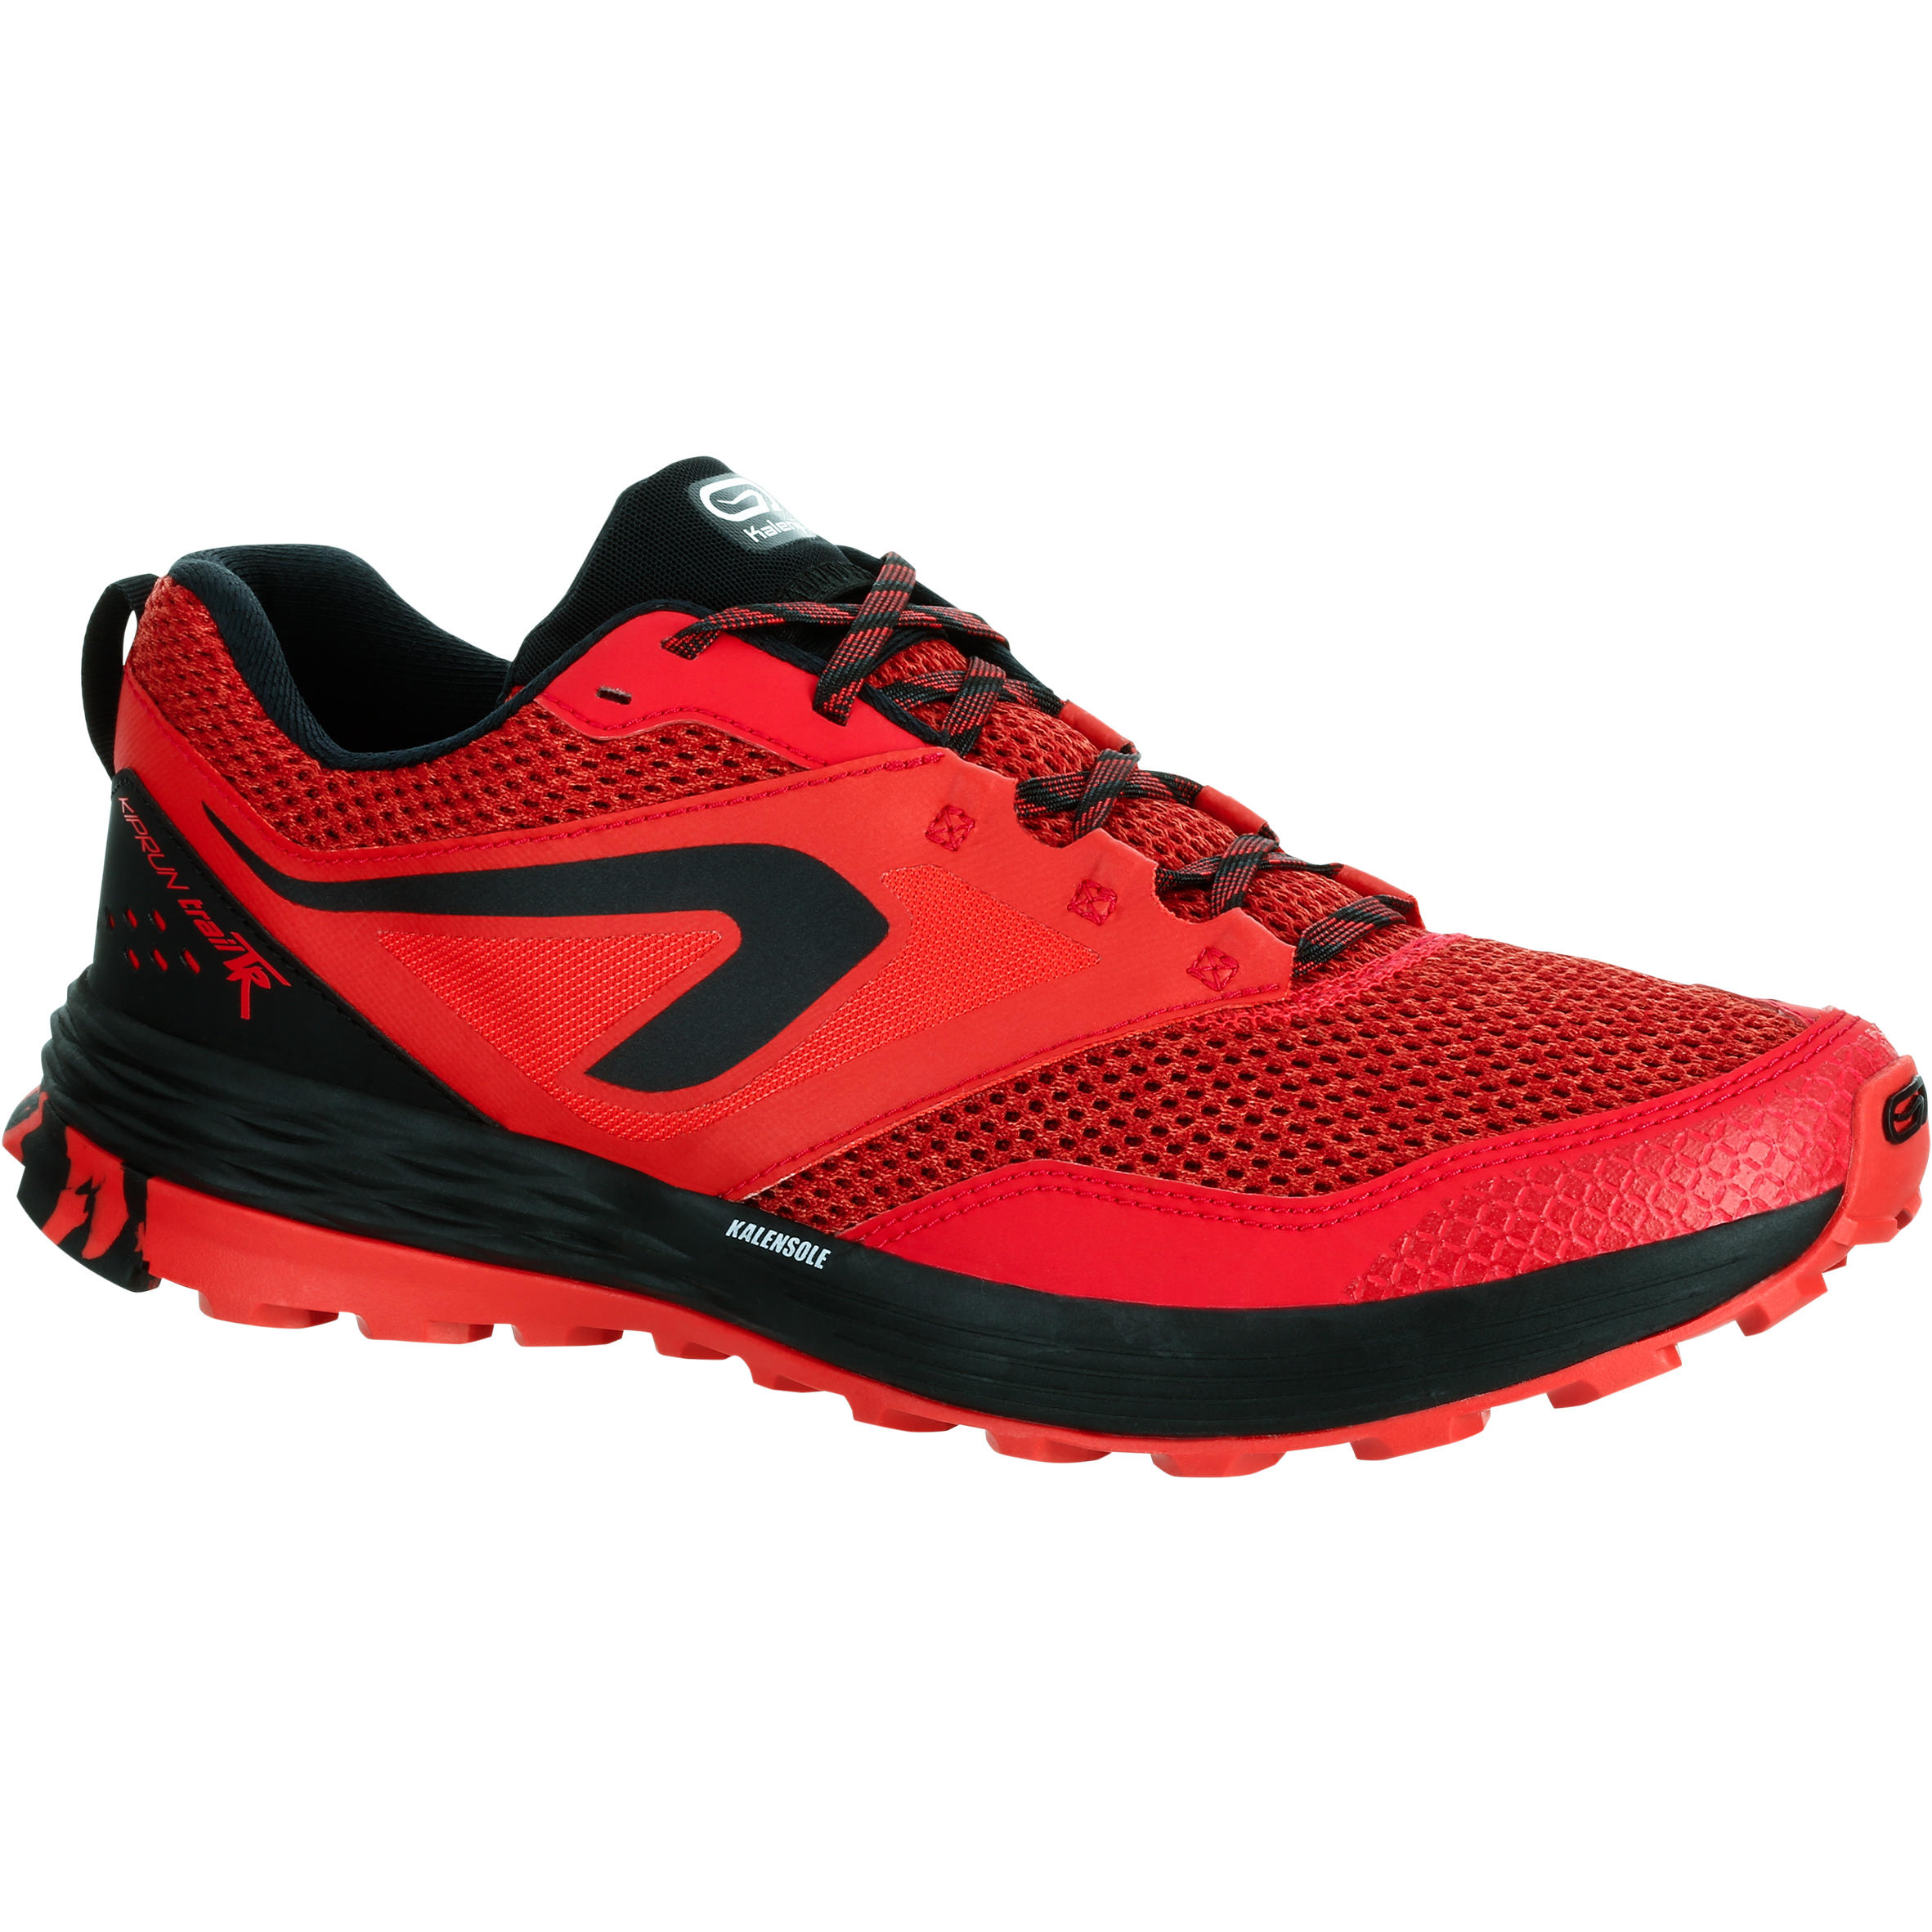 Rouge Kiprun Tr Running Homme Trail Noir Chaussure uiwTZlOPkX